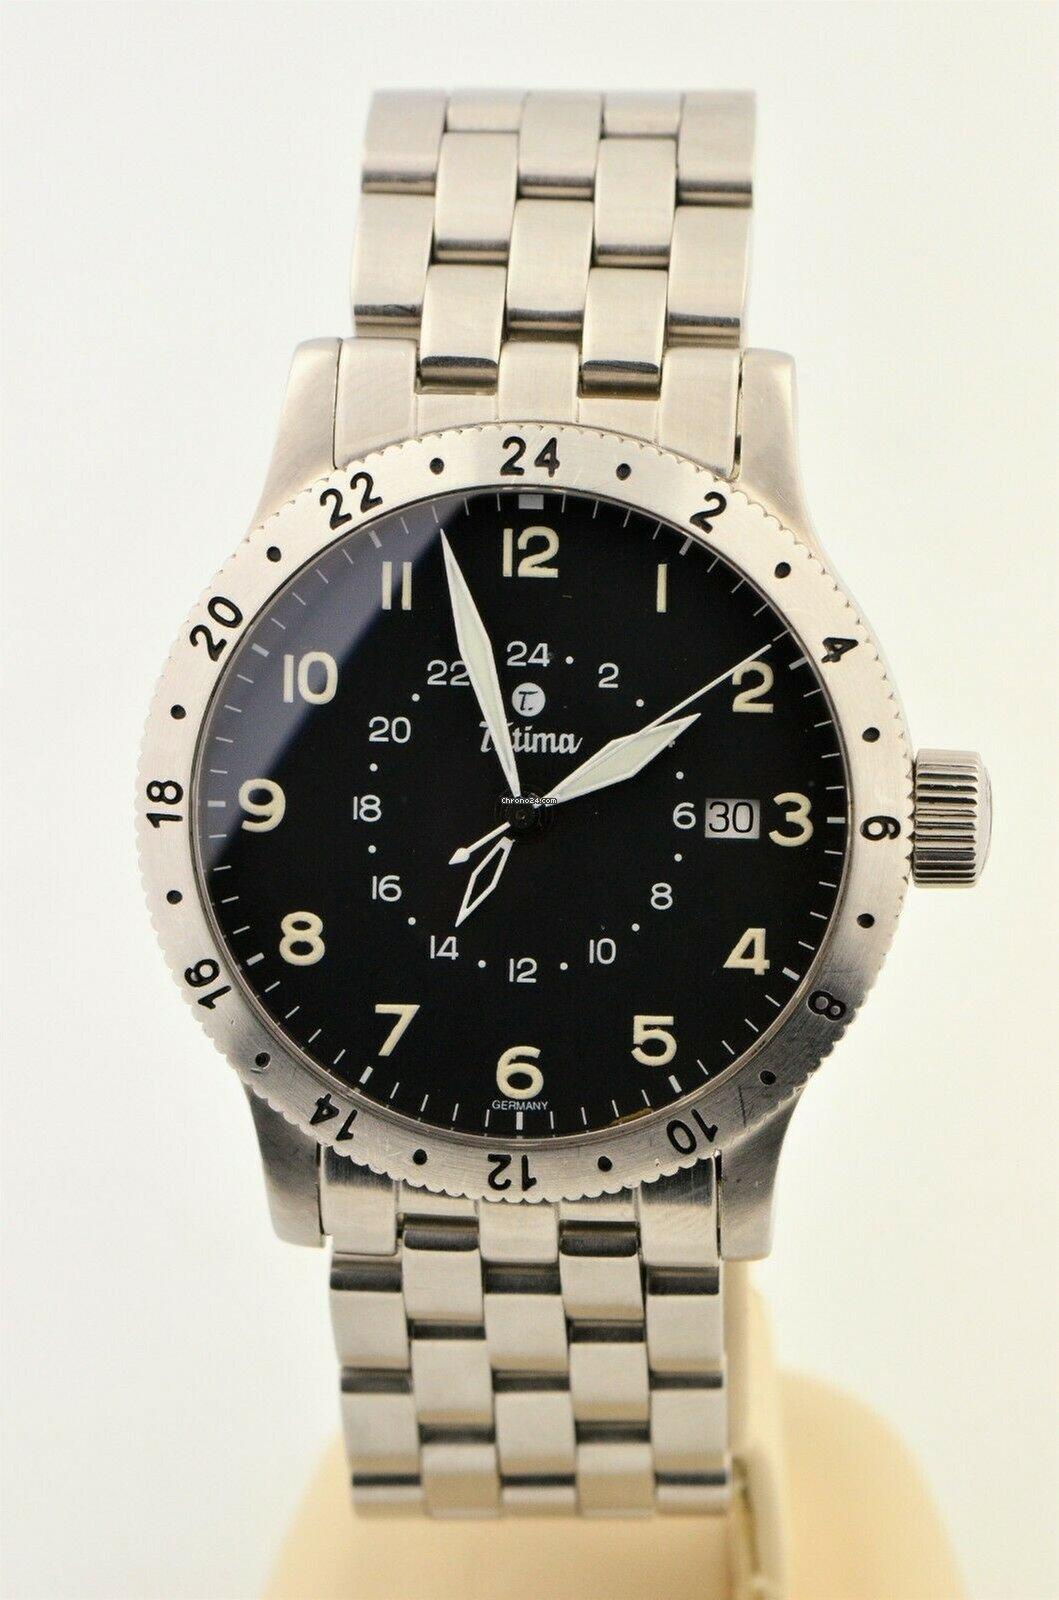 Tutima Fx Utc Gmt Automatic Stainless Steel German Watch